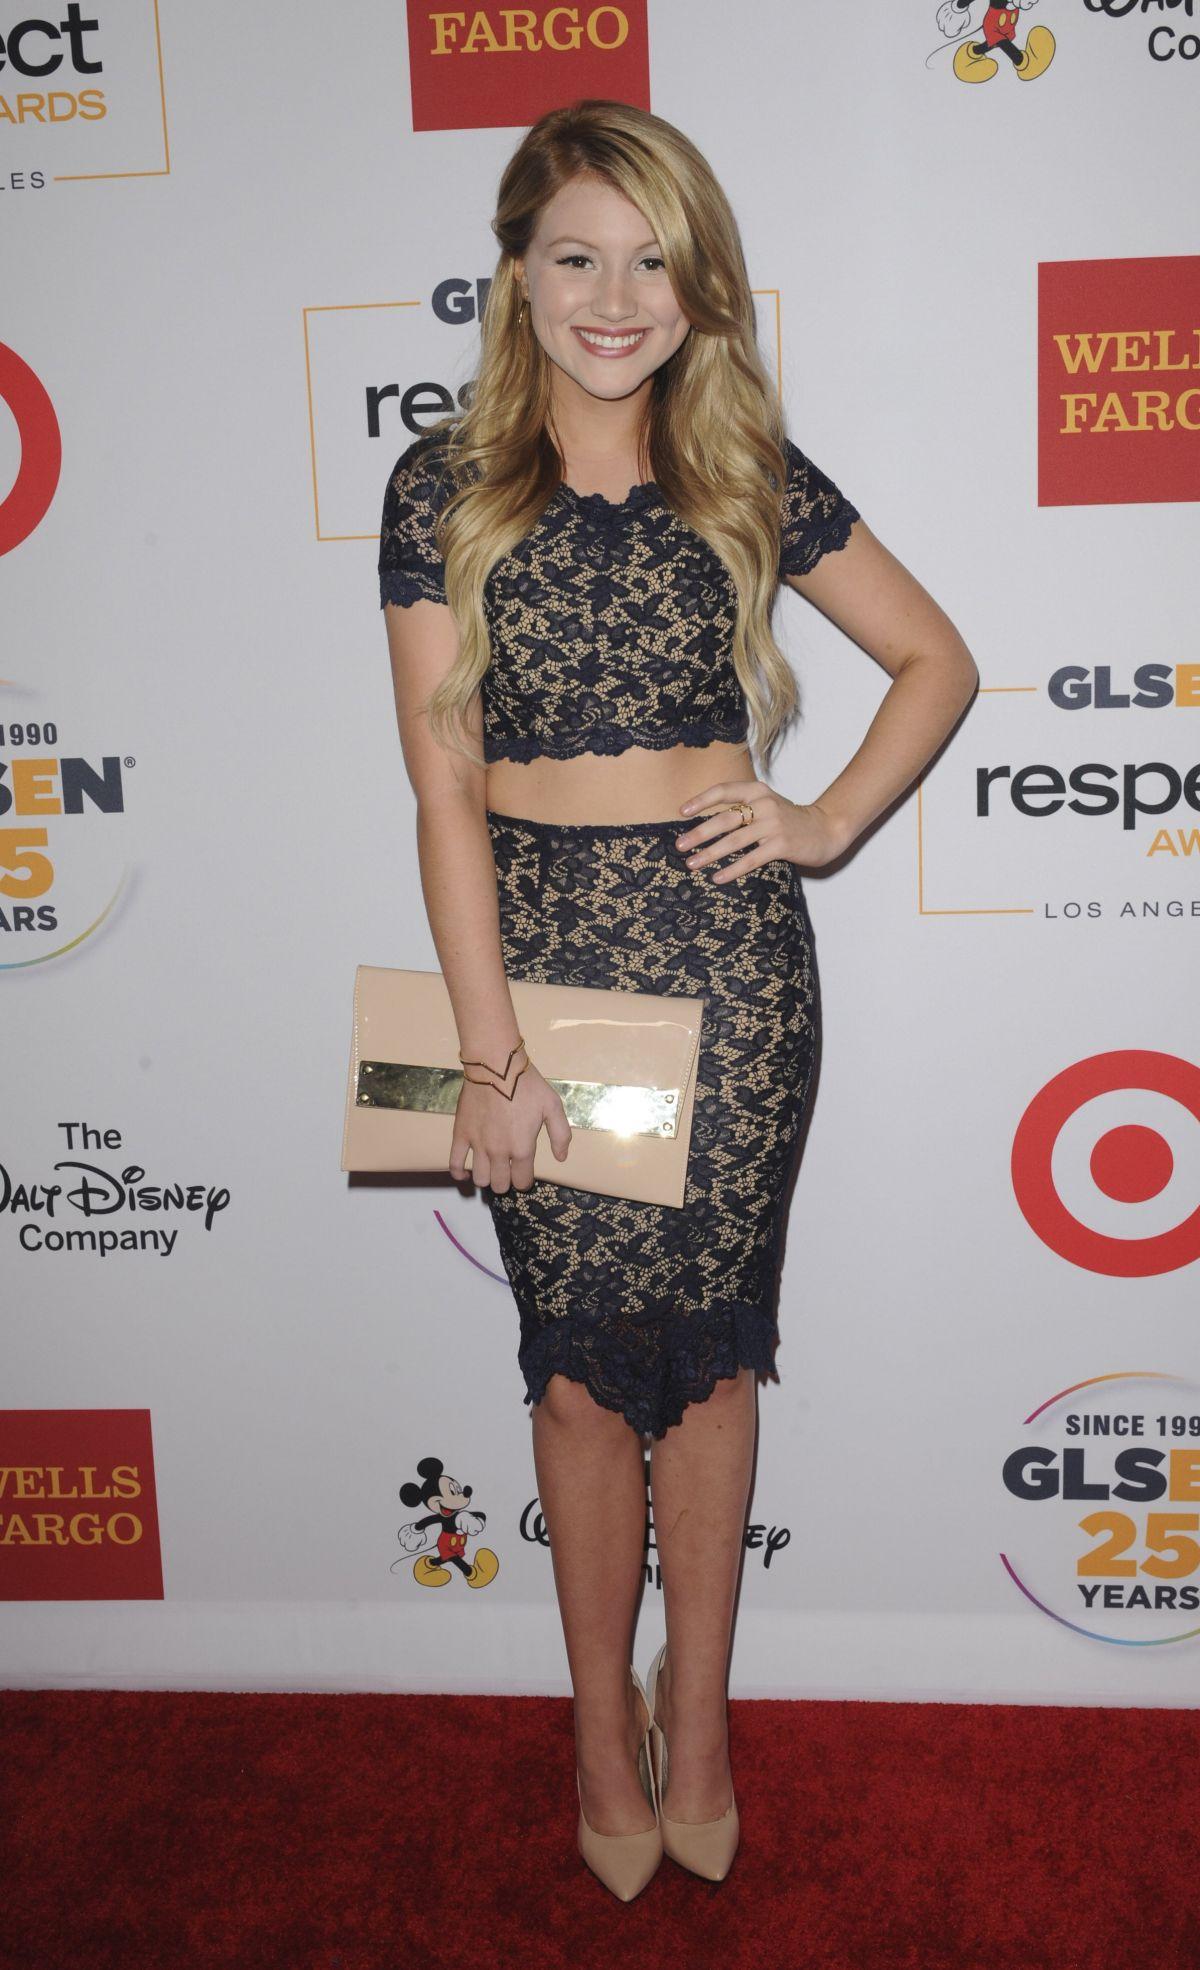 BROOKE SORENSON at 2015 glsen Respect Awards in Beverly Hills 10/23/2015